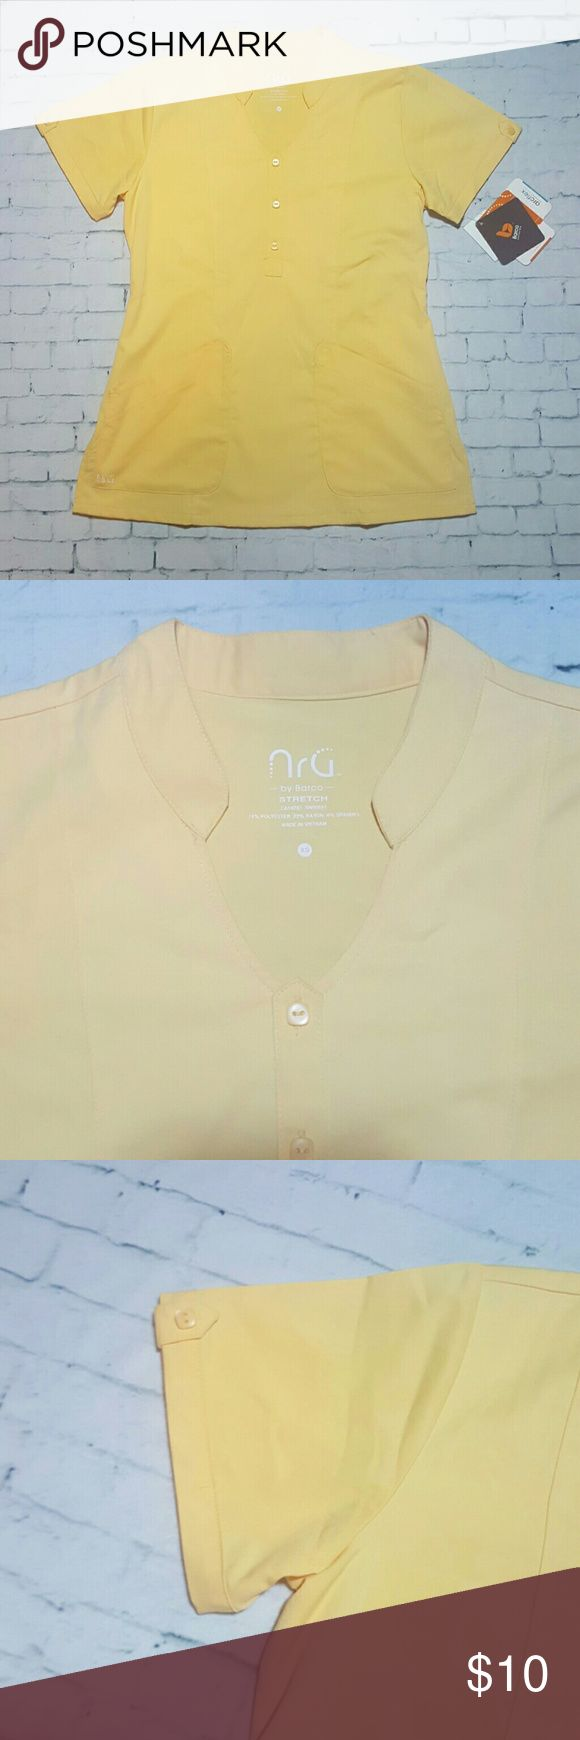 NRG Barco Scrub Top New with tags.  Color: Lemon drop.  Two scrub tops for $16  Grey's Anatomy  Urbane HeartSoul  Iguana  Dickies Med Couture Cherokee  Koi Landau Barco Tops